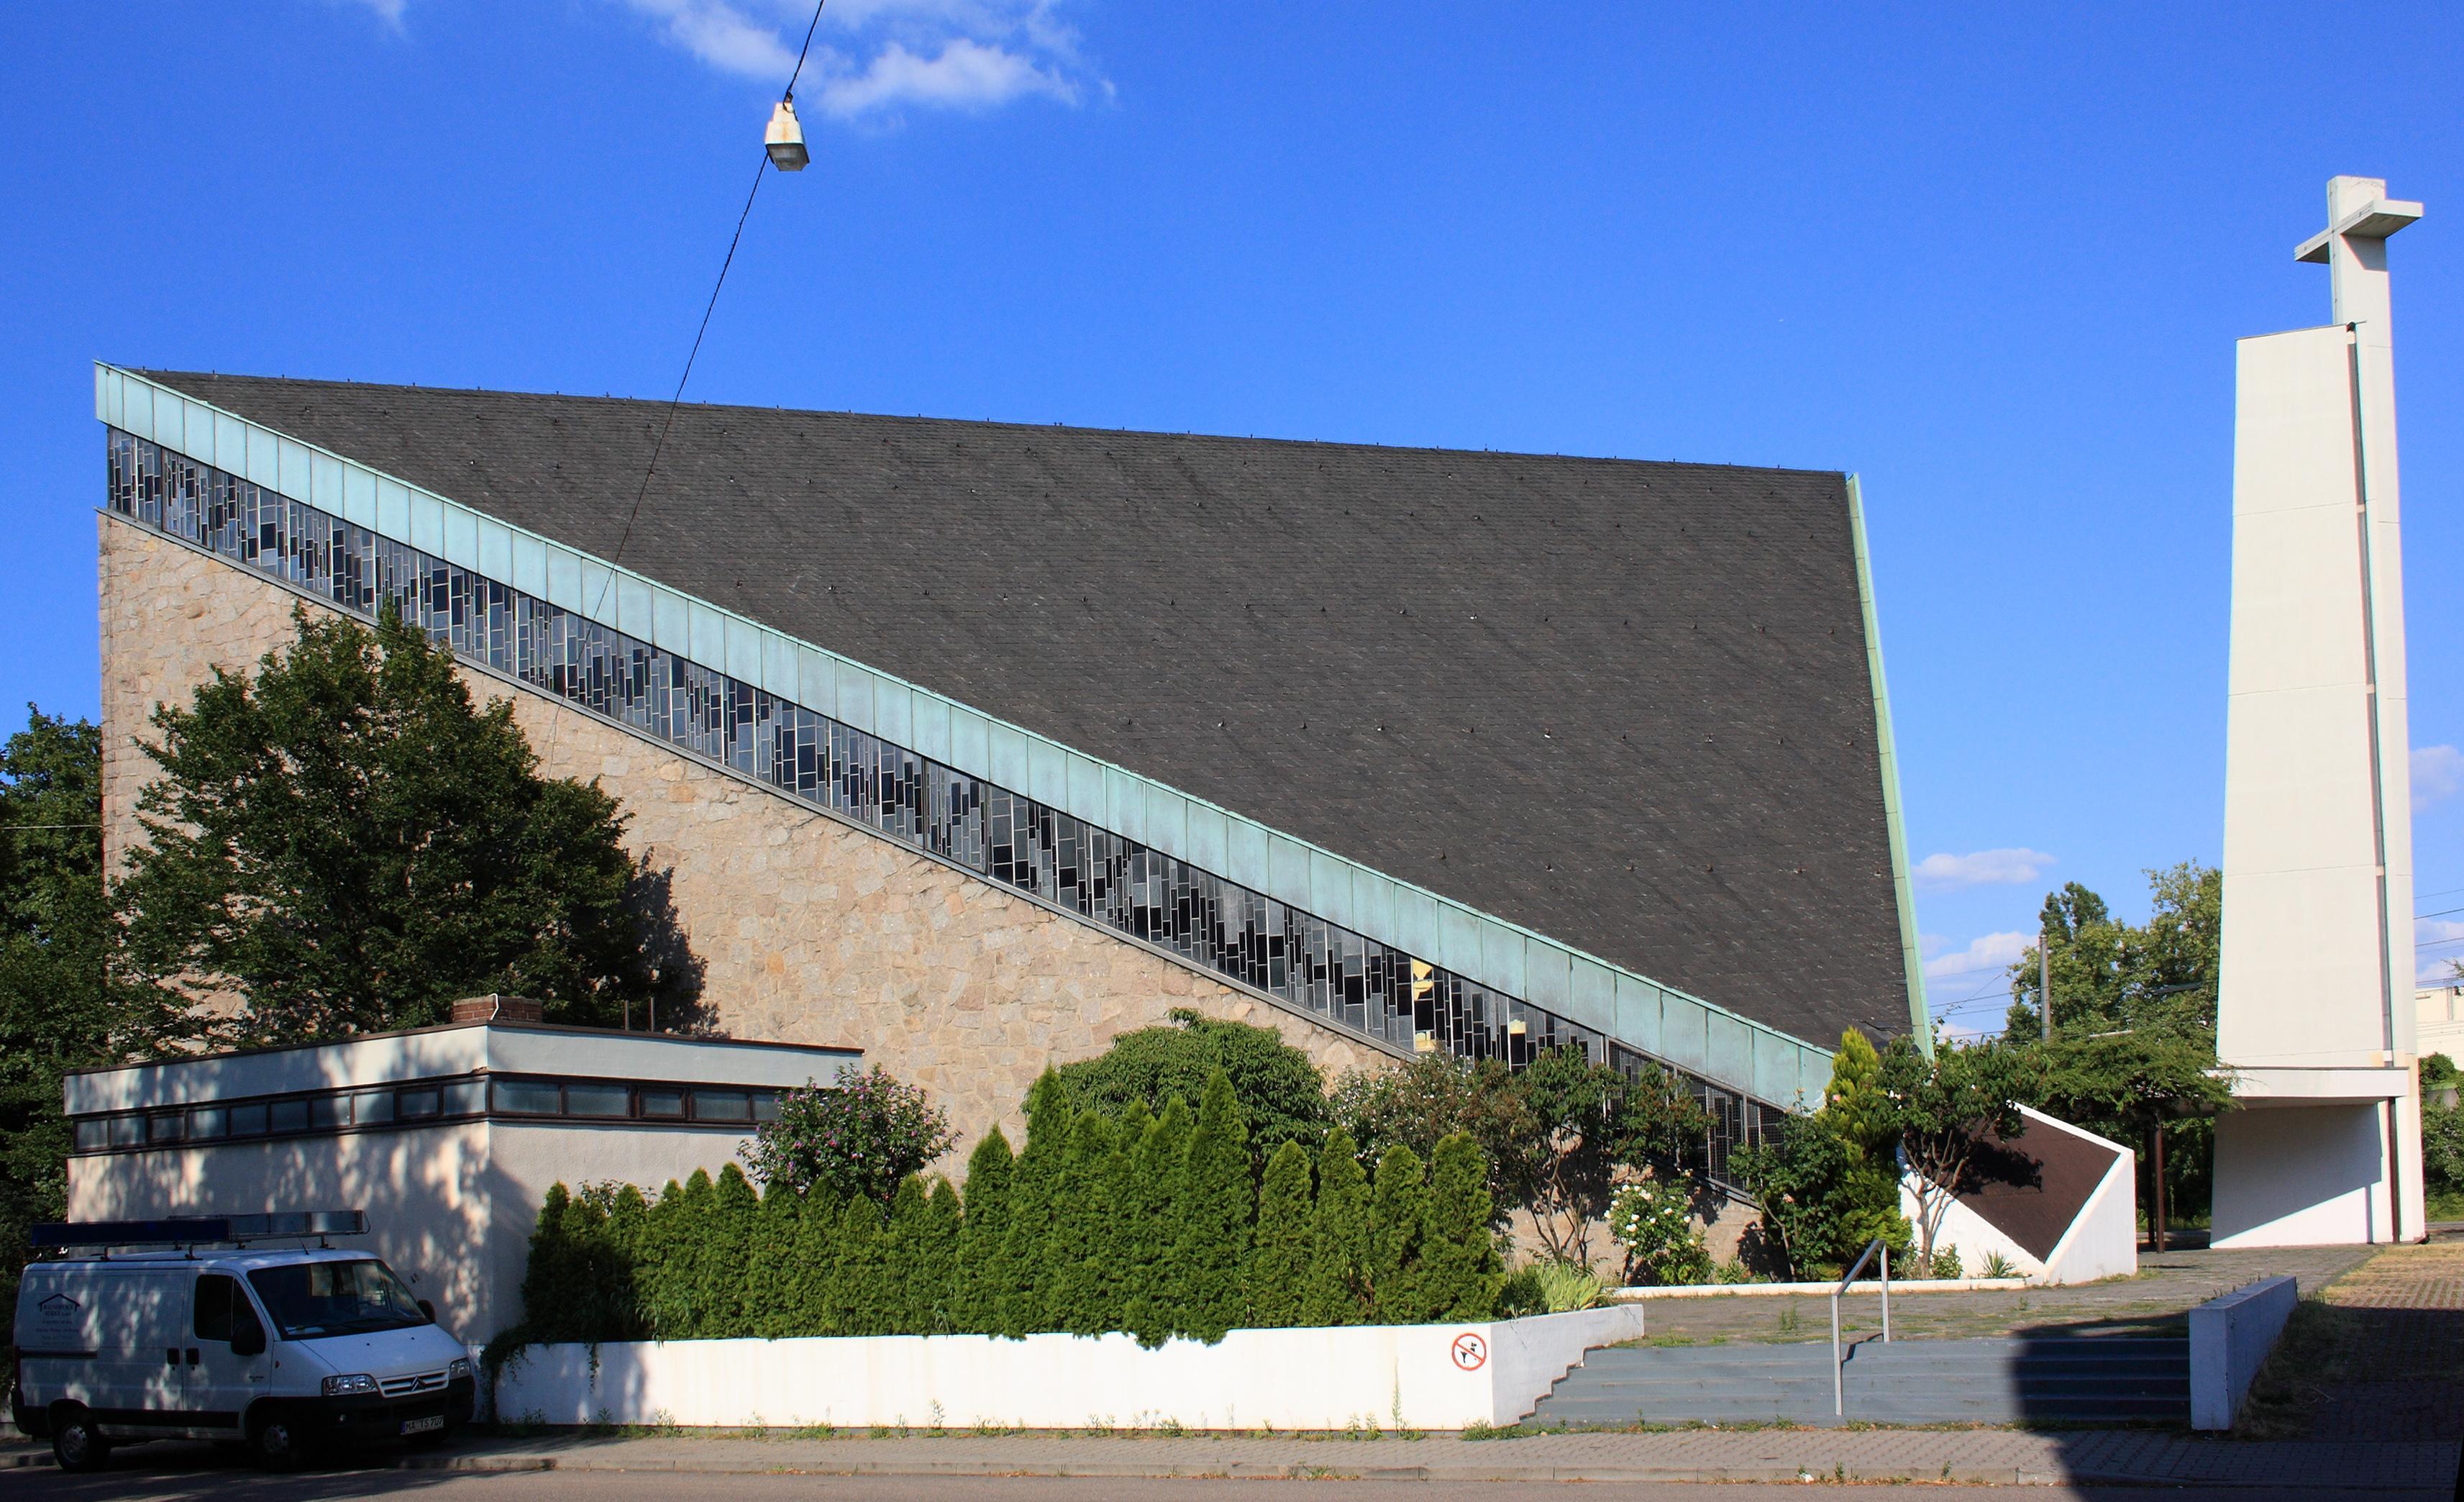 Käfertal kirche mannheim orthodoxe Unionskirche